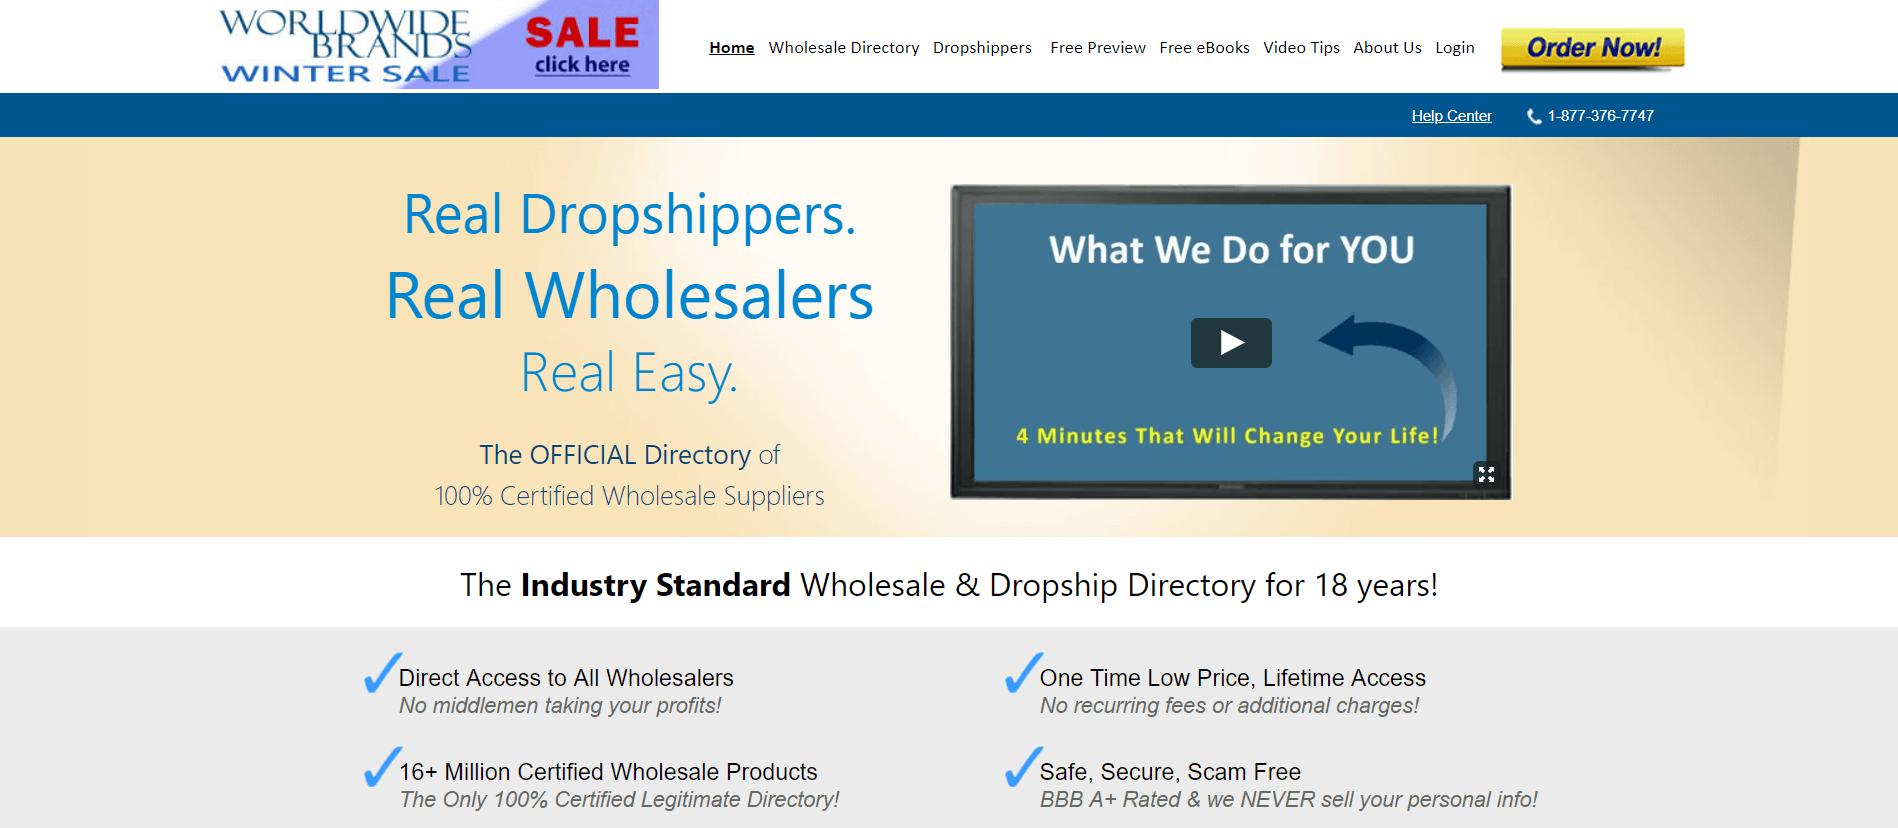 Worldwide brands (Wholesaler suppliers)